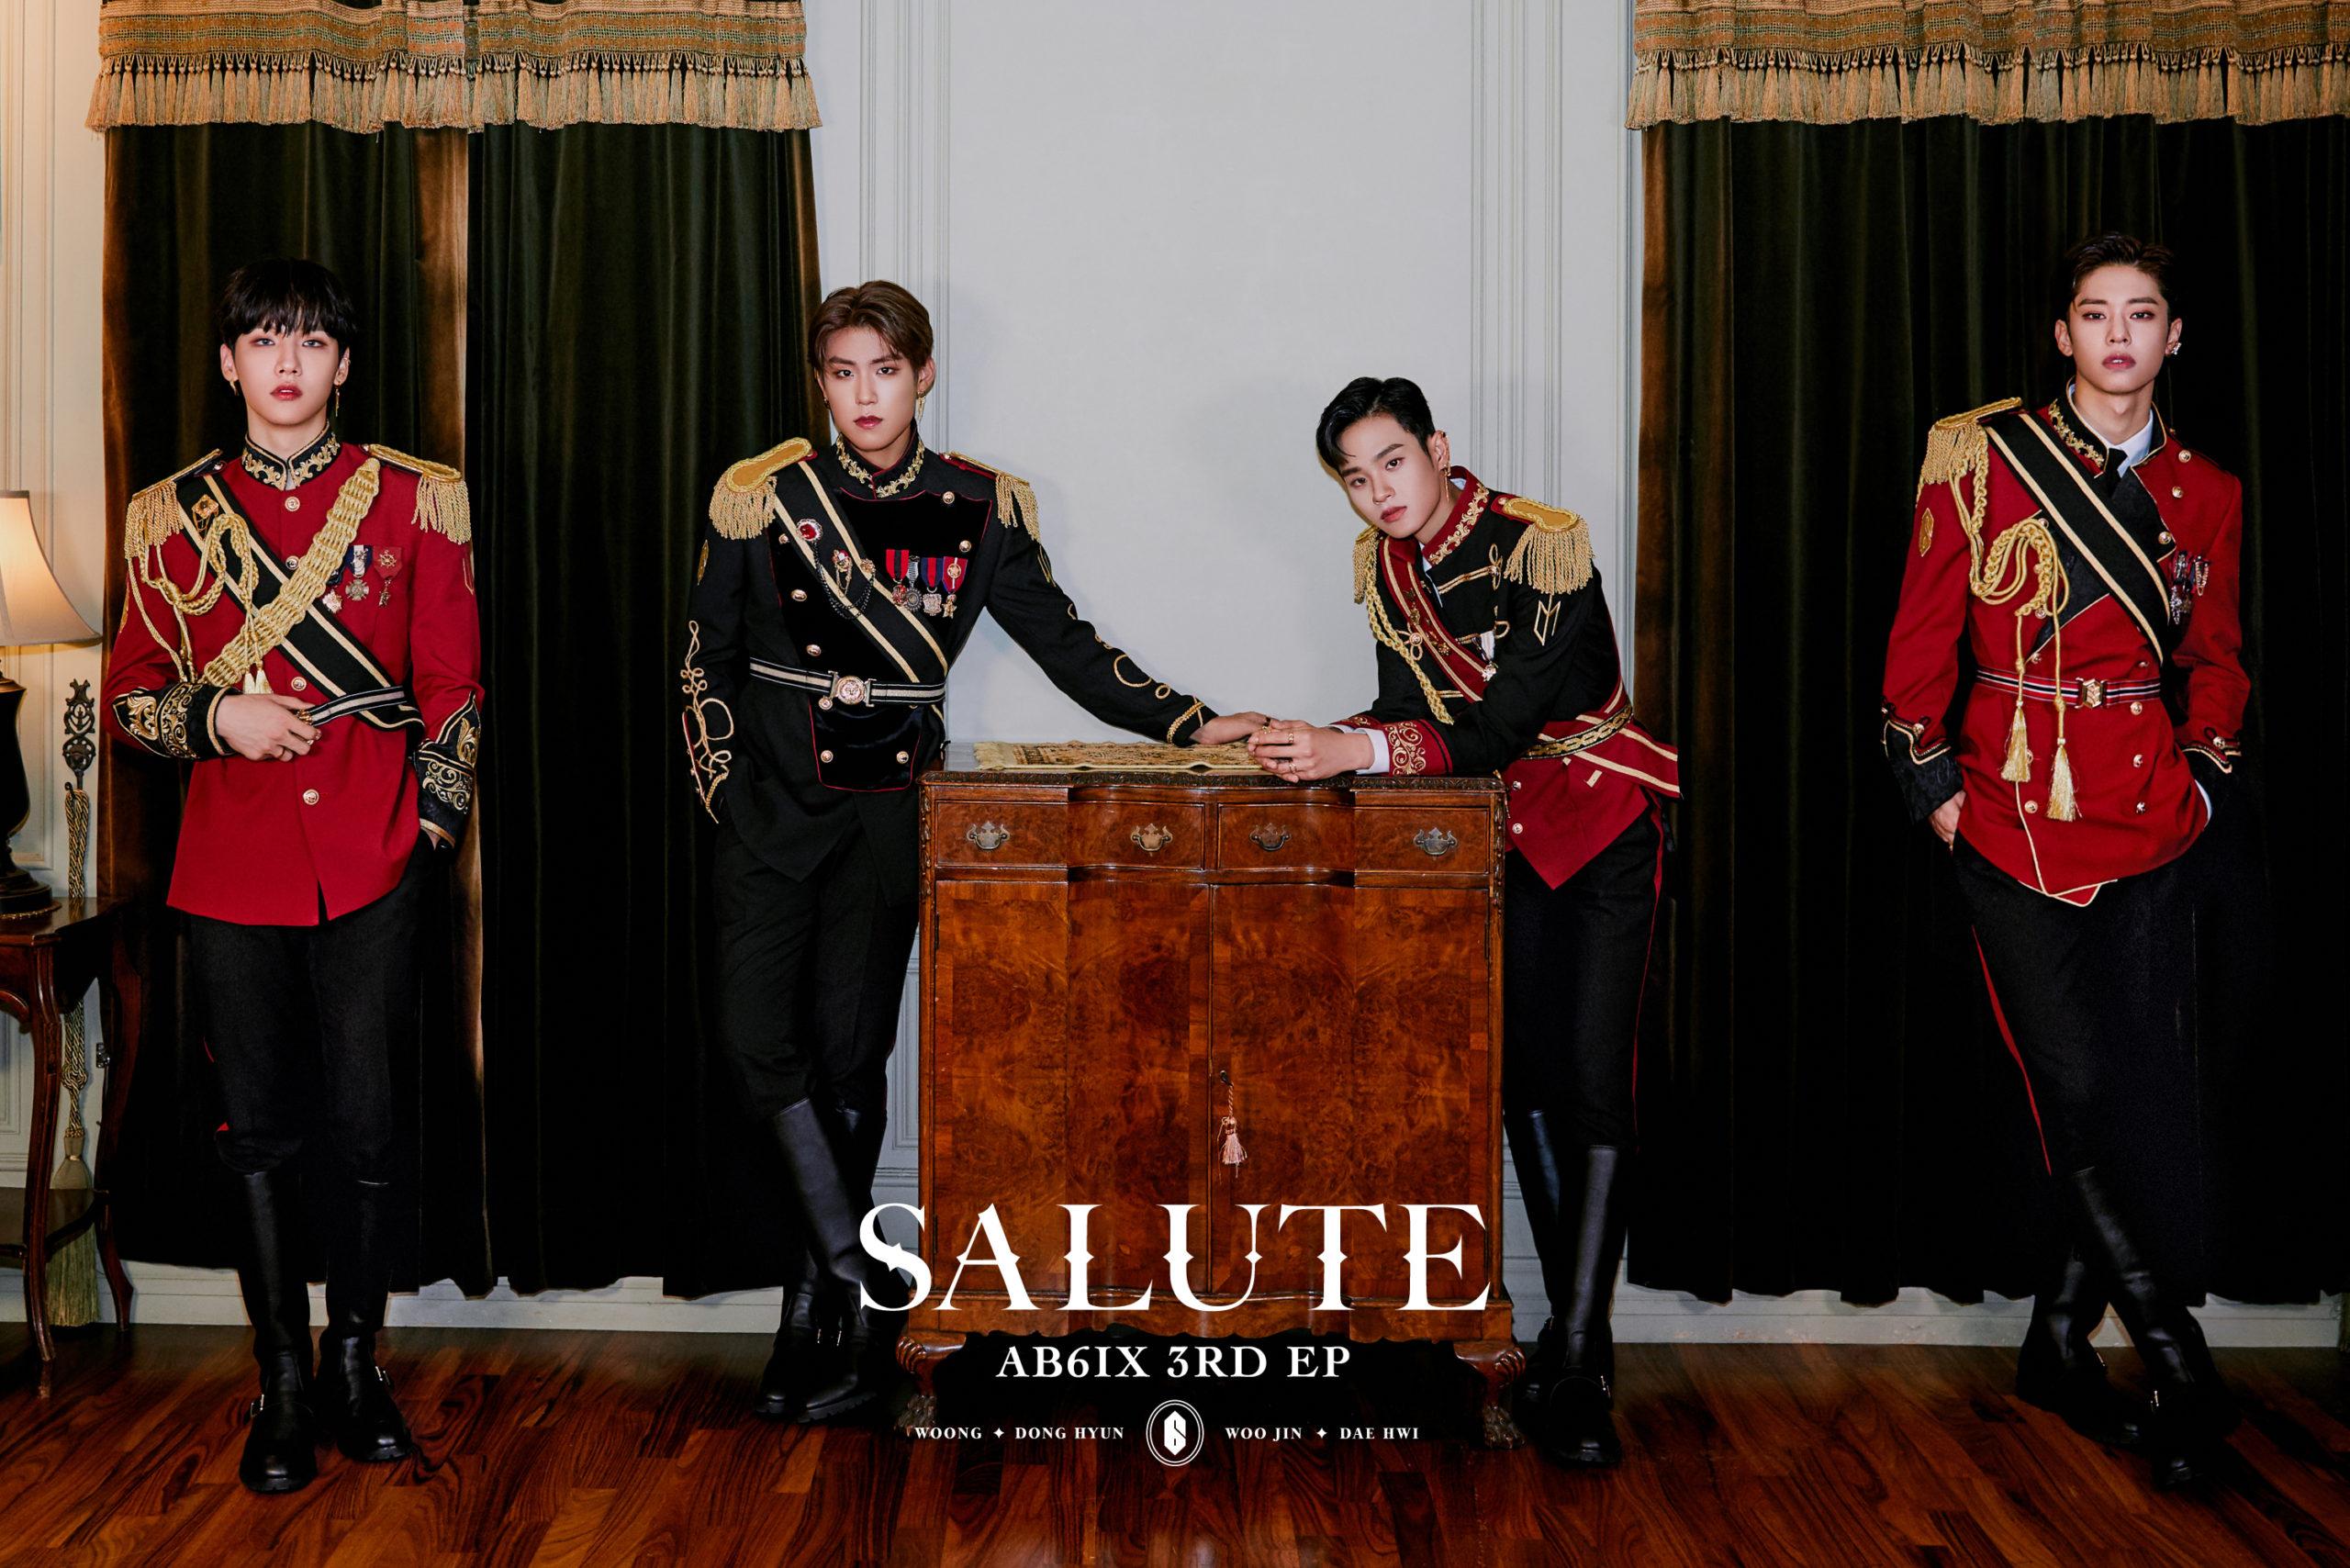 AB6IX 3RD EP 'SALUTE'